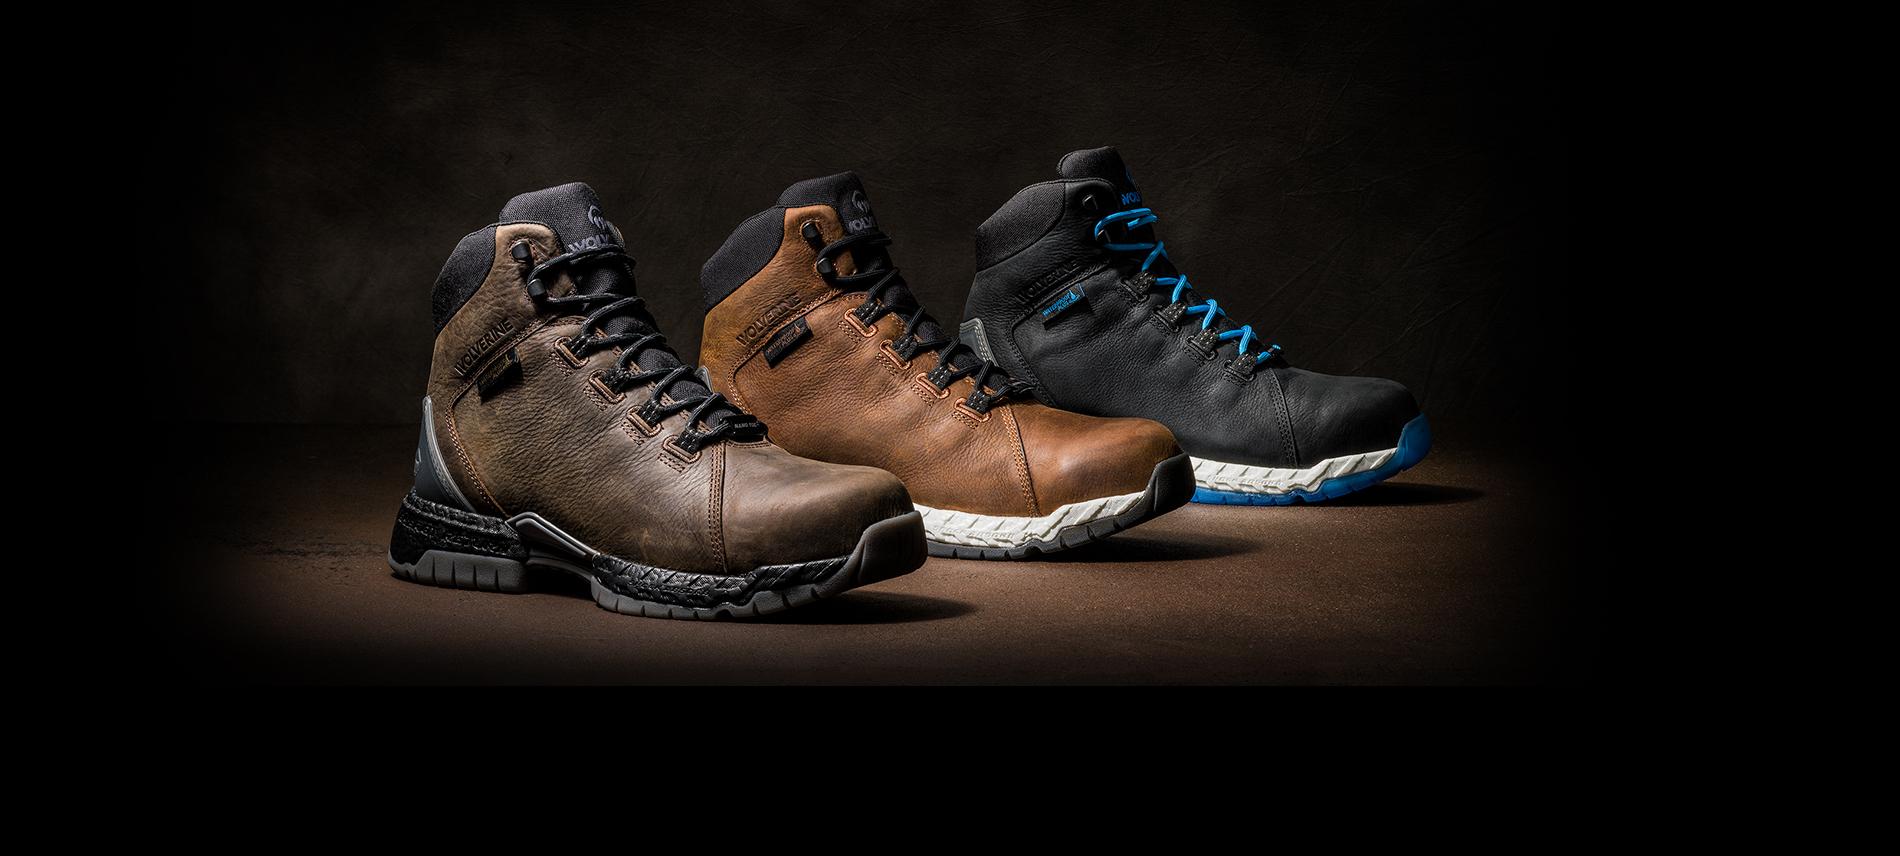 Rush Boots